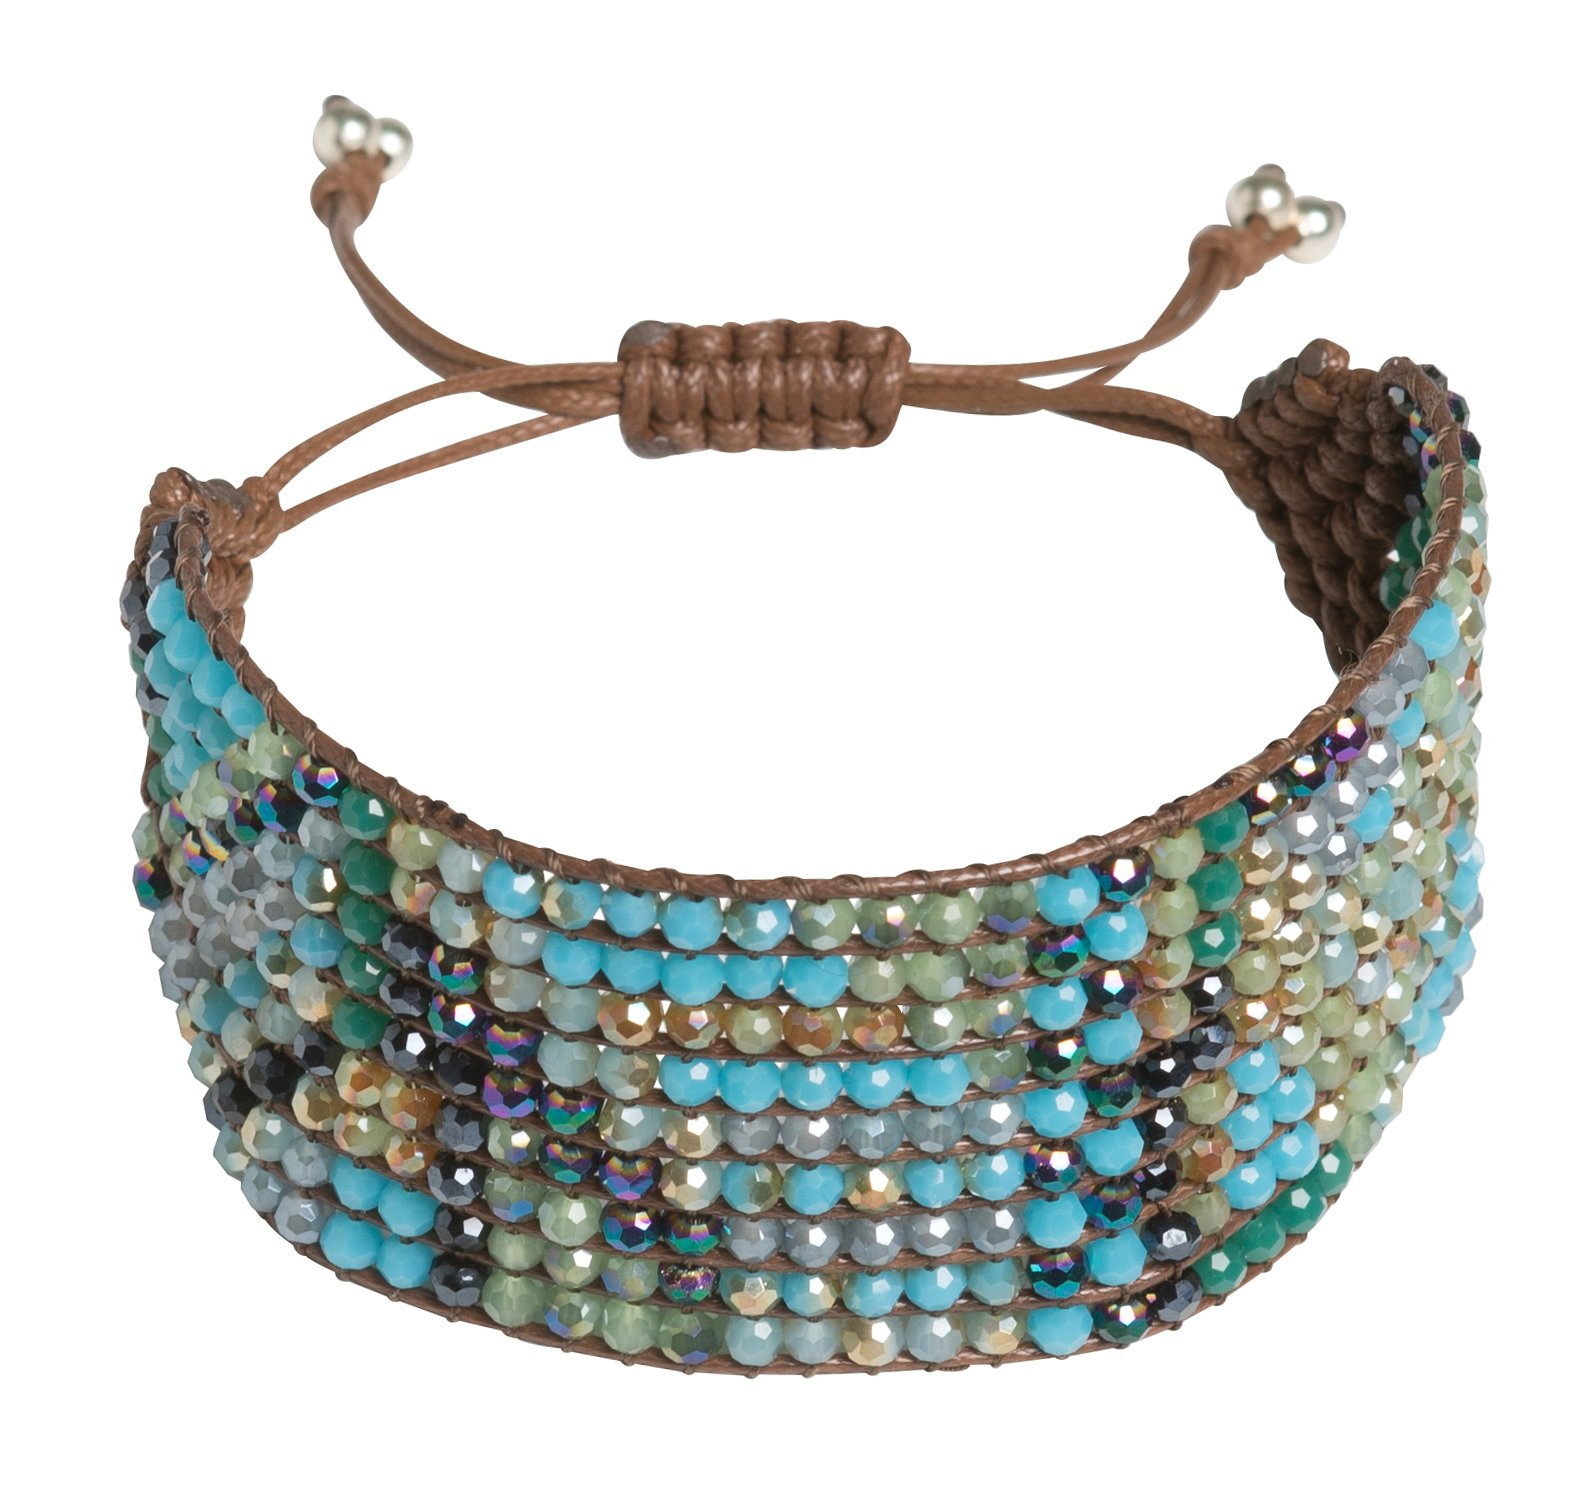 Joop Joop Handmade Crystal Turquoise Boho Beaded Statement Wrap Cuff Bracelet with Slider Opening